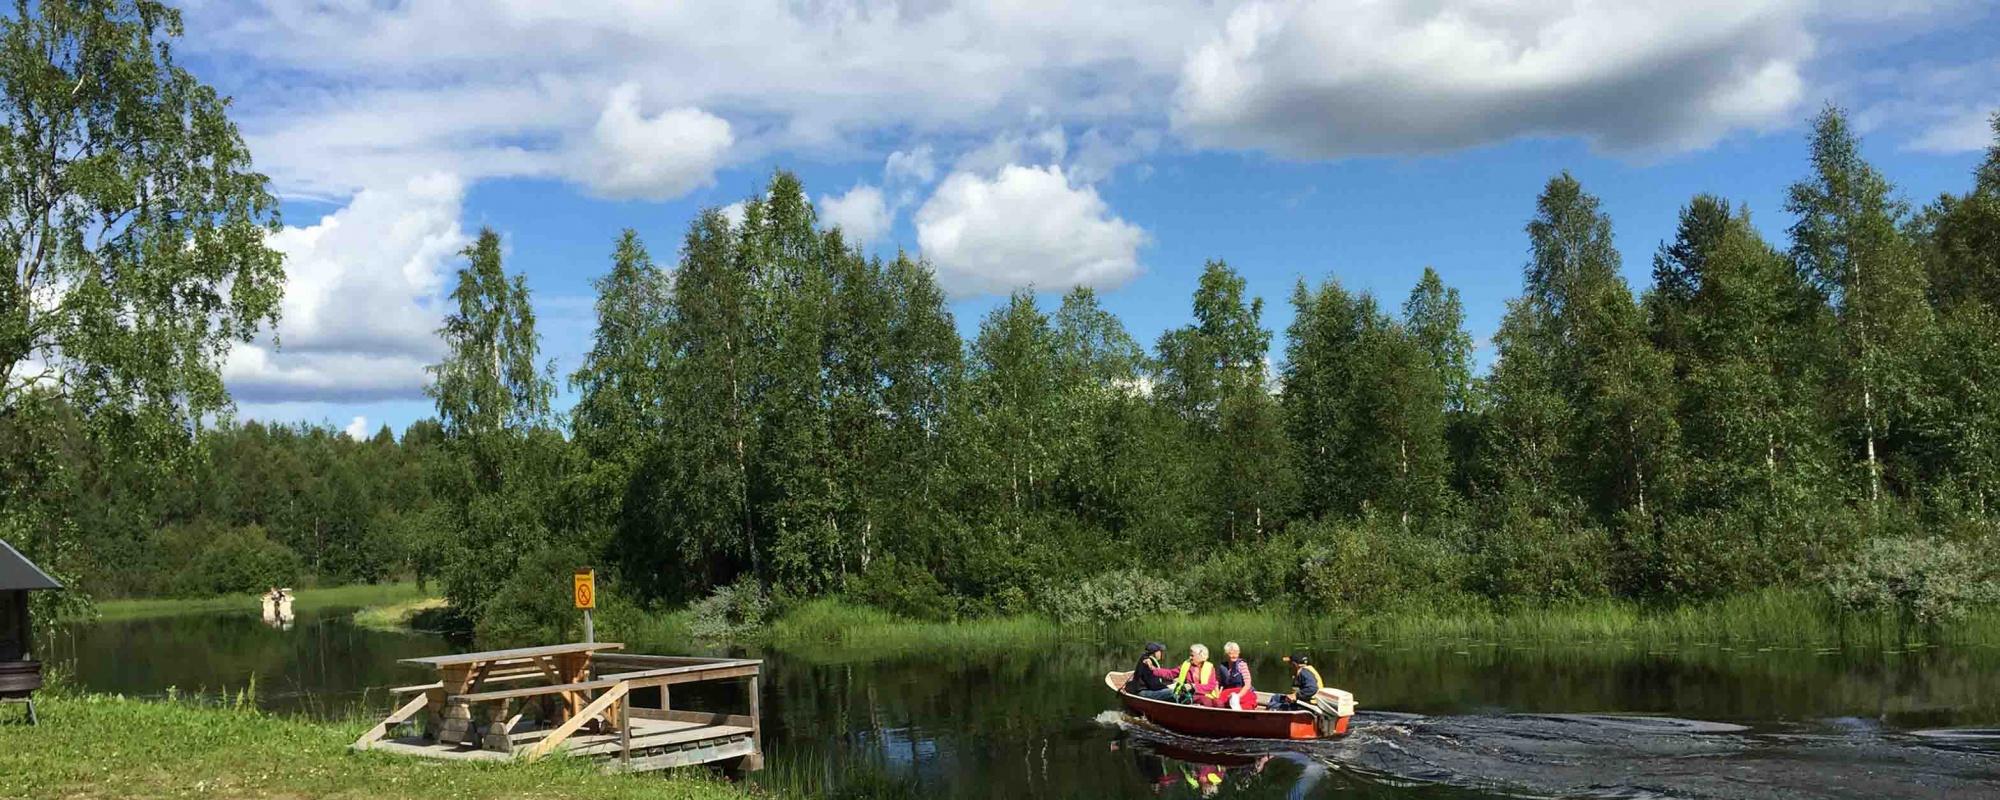 Boat trip on Risån in Innansjön